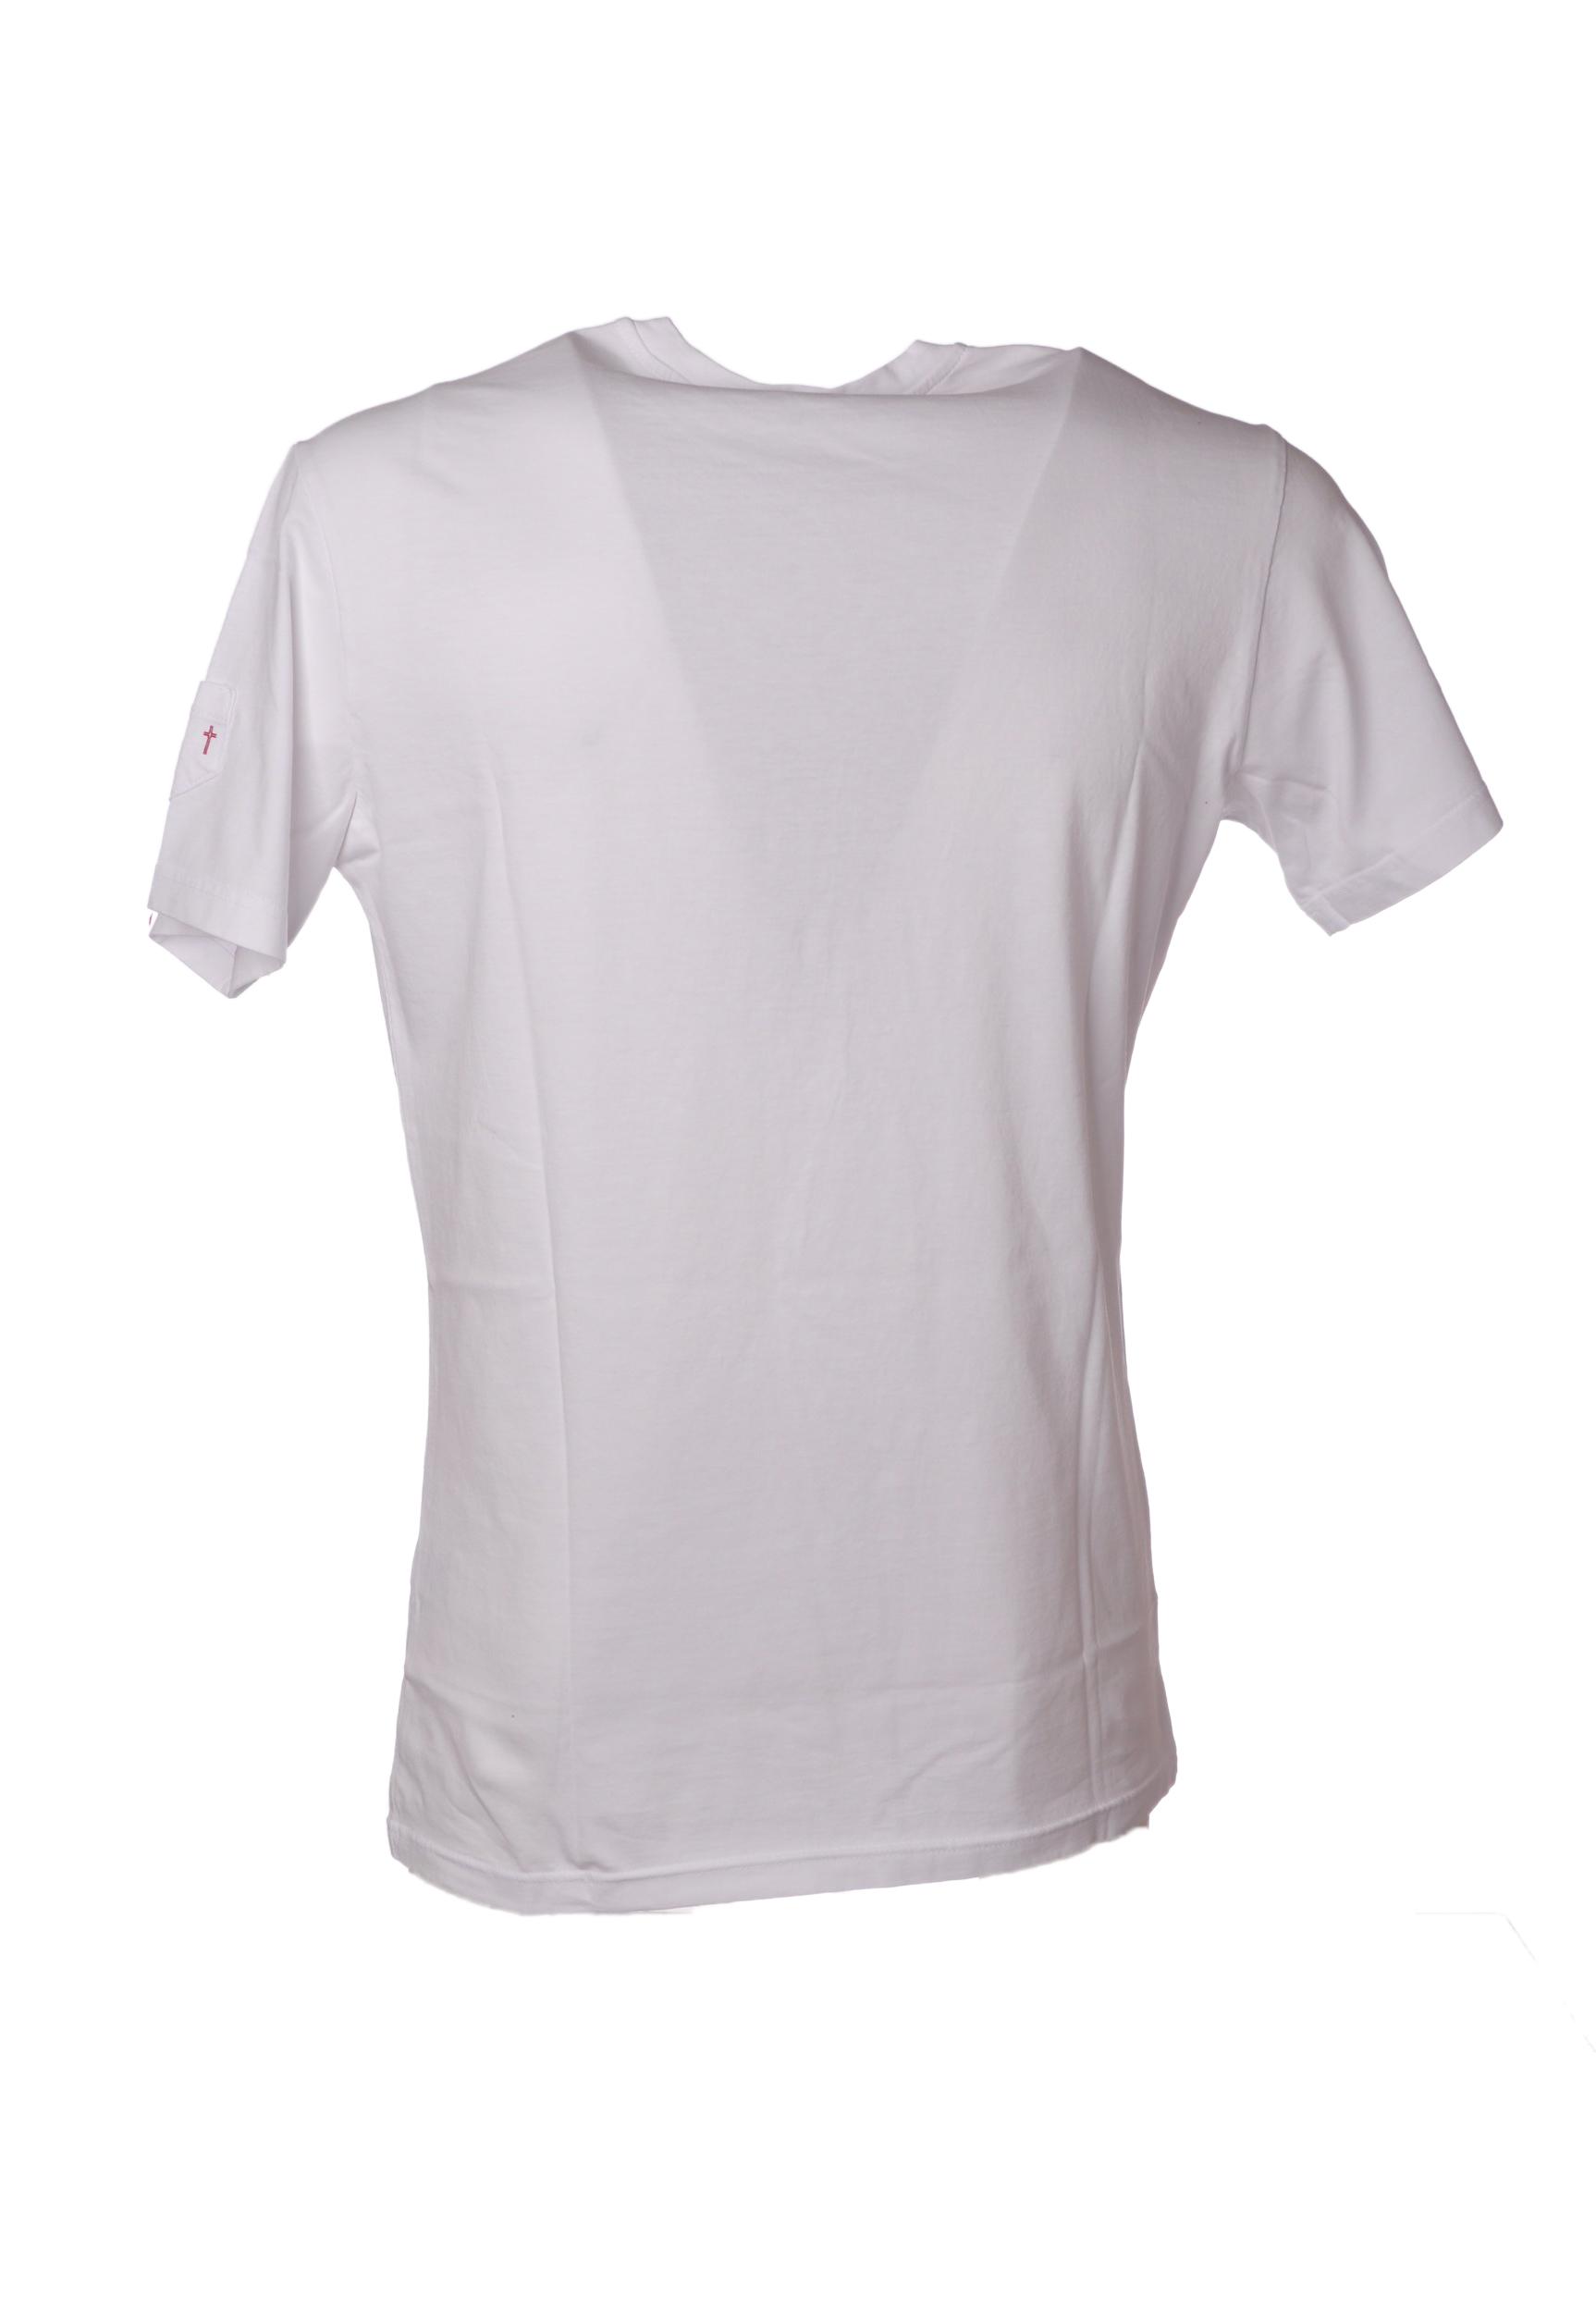 "Daniele Alessandrini ""t-shirt con stampa"" T-shirts"